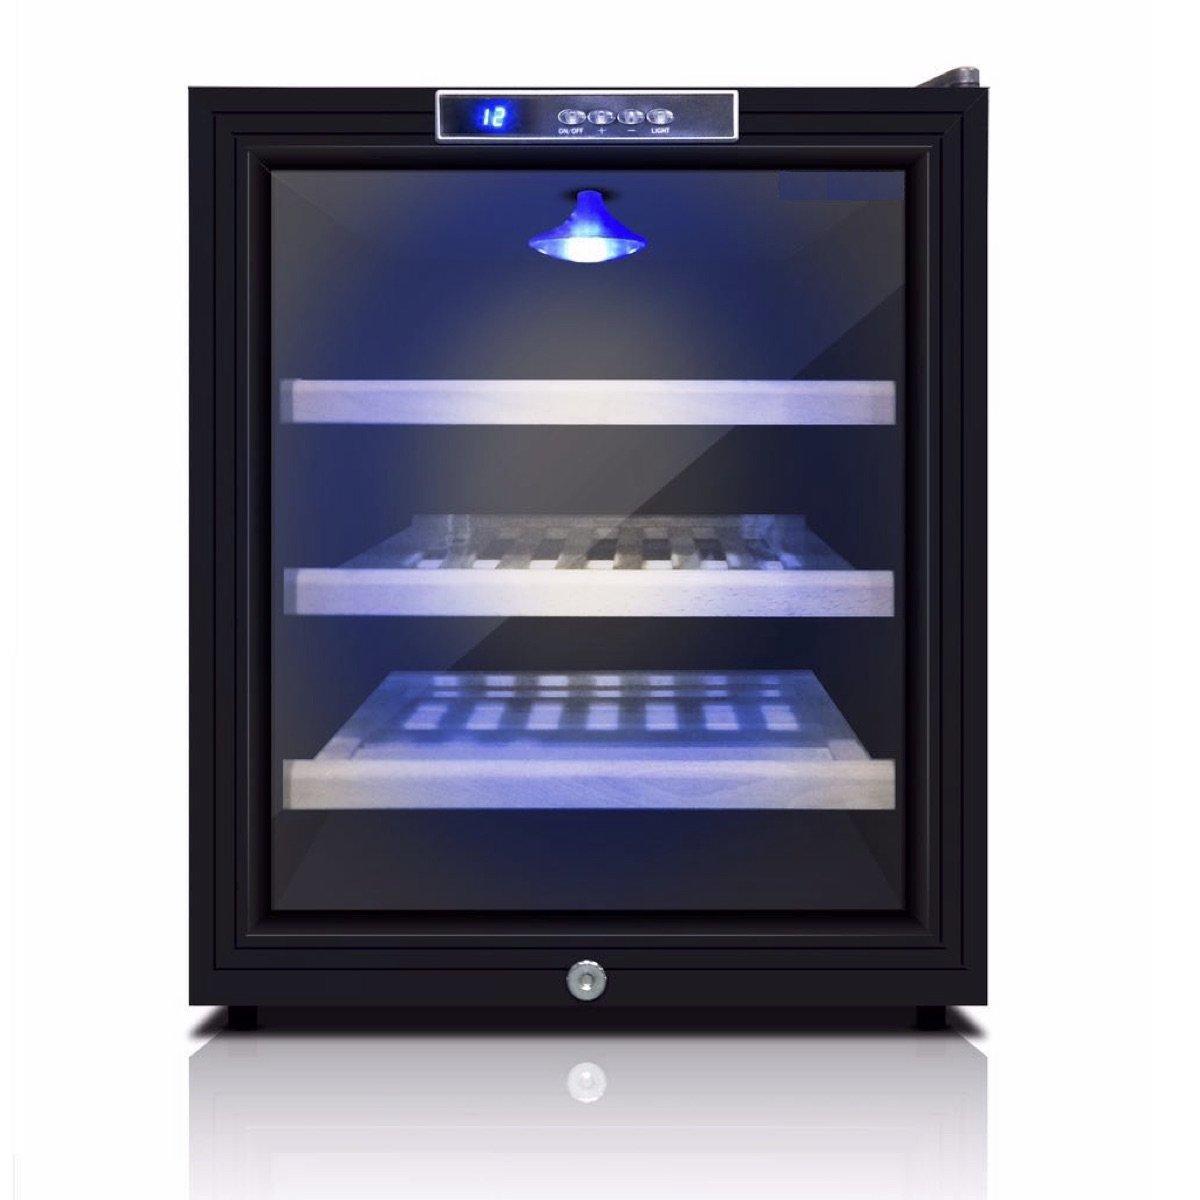 Game Room Mini Wine Refrigerator | Bar Fridge | KingsBottle 11 Bottle Storage Free Standing compatible Wine Fridge - KBU52WBP